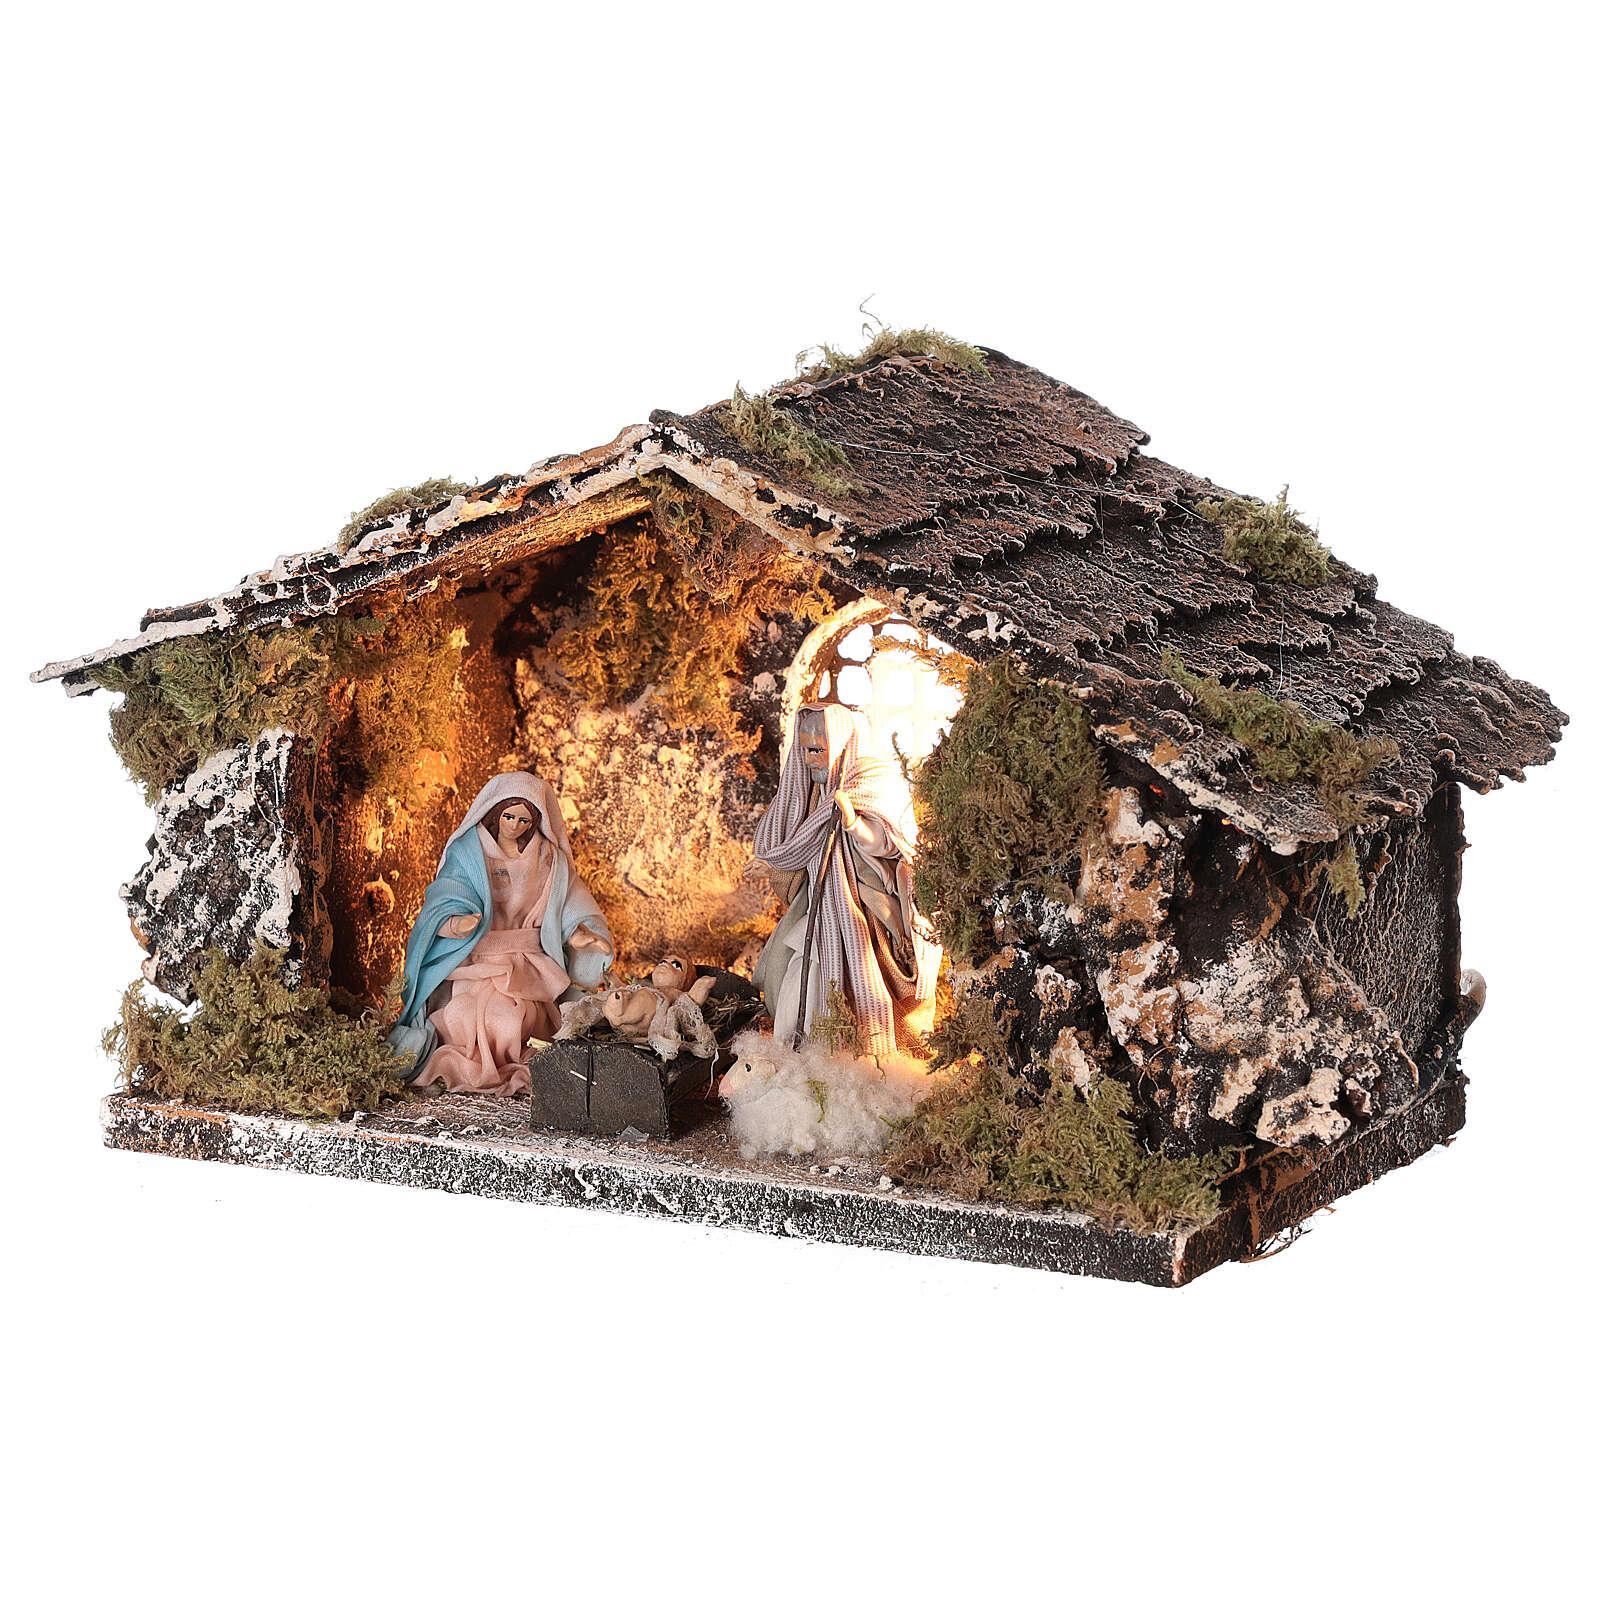 Stable with Nativity statue terracotta fabric 8 cm Neapolitan nativity 15x30x15 cm 4